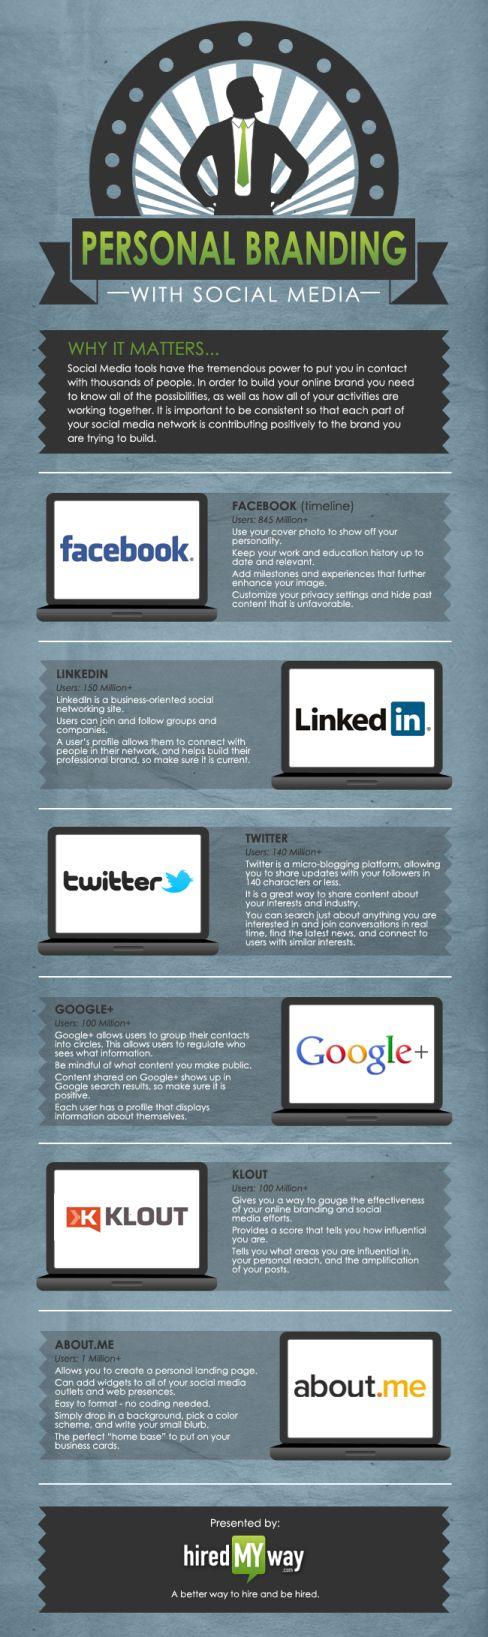 sosyal_medyada_kisisel_marka_infografik